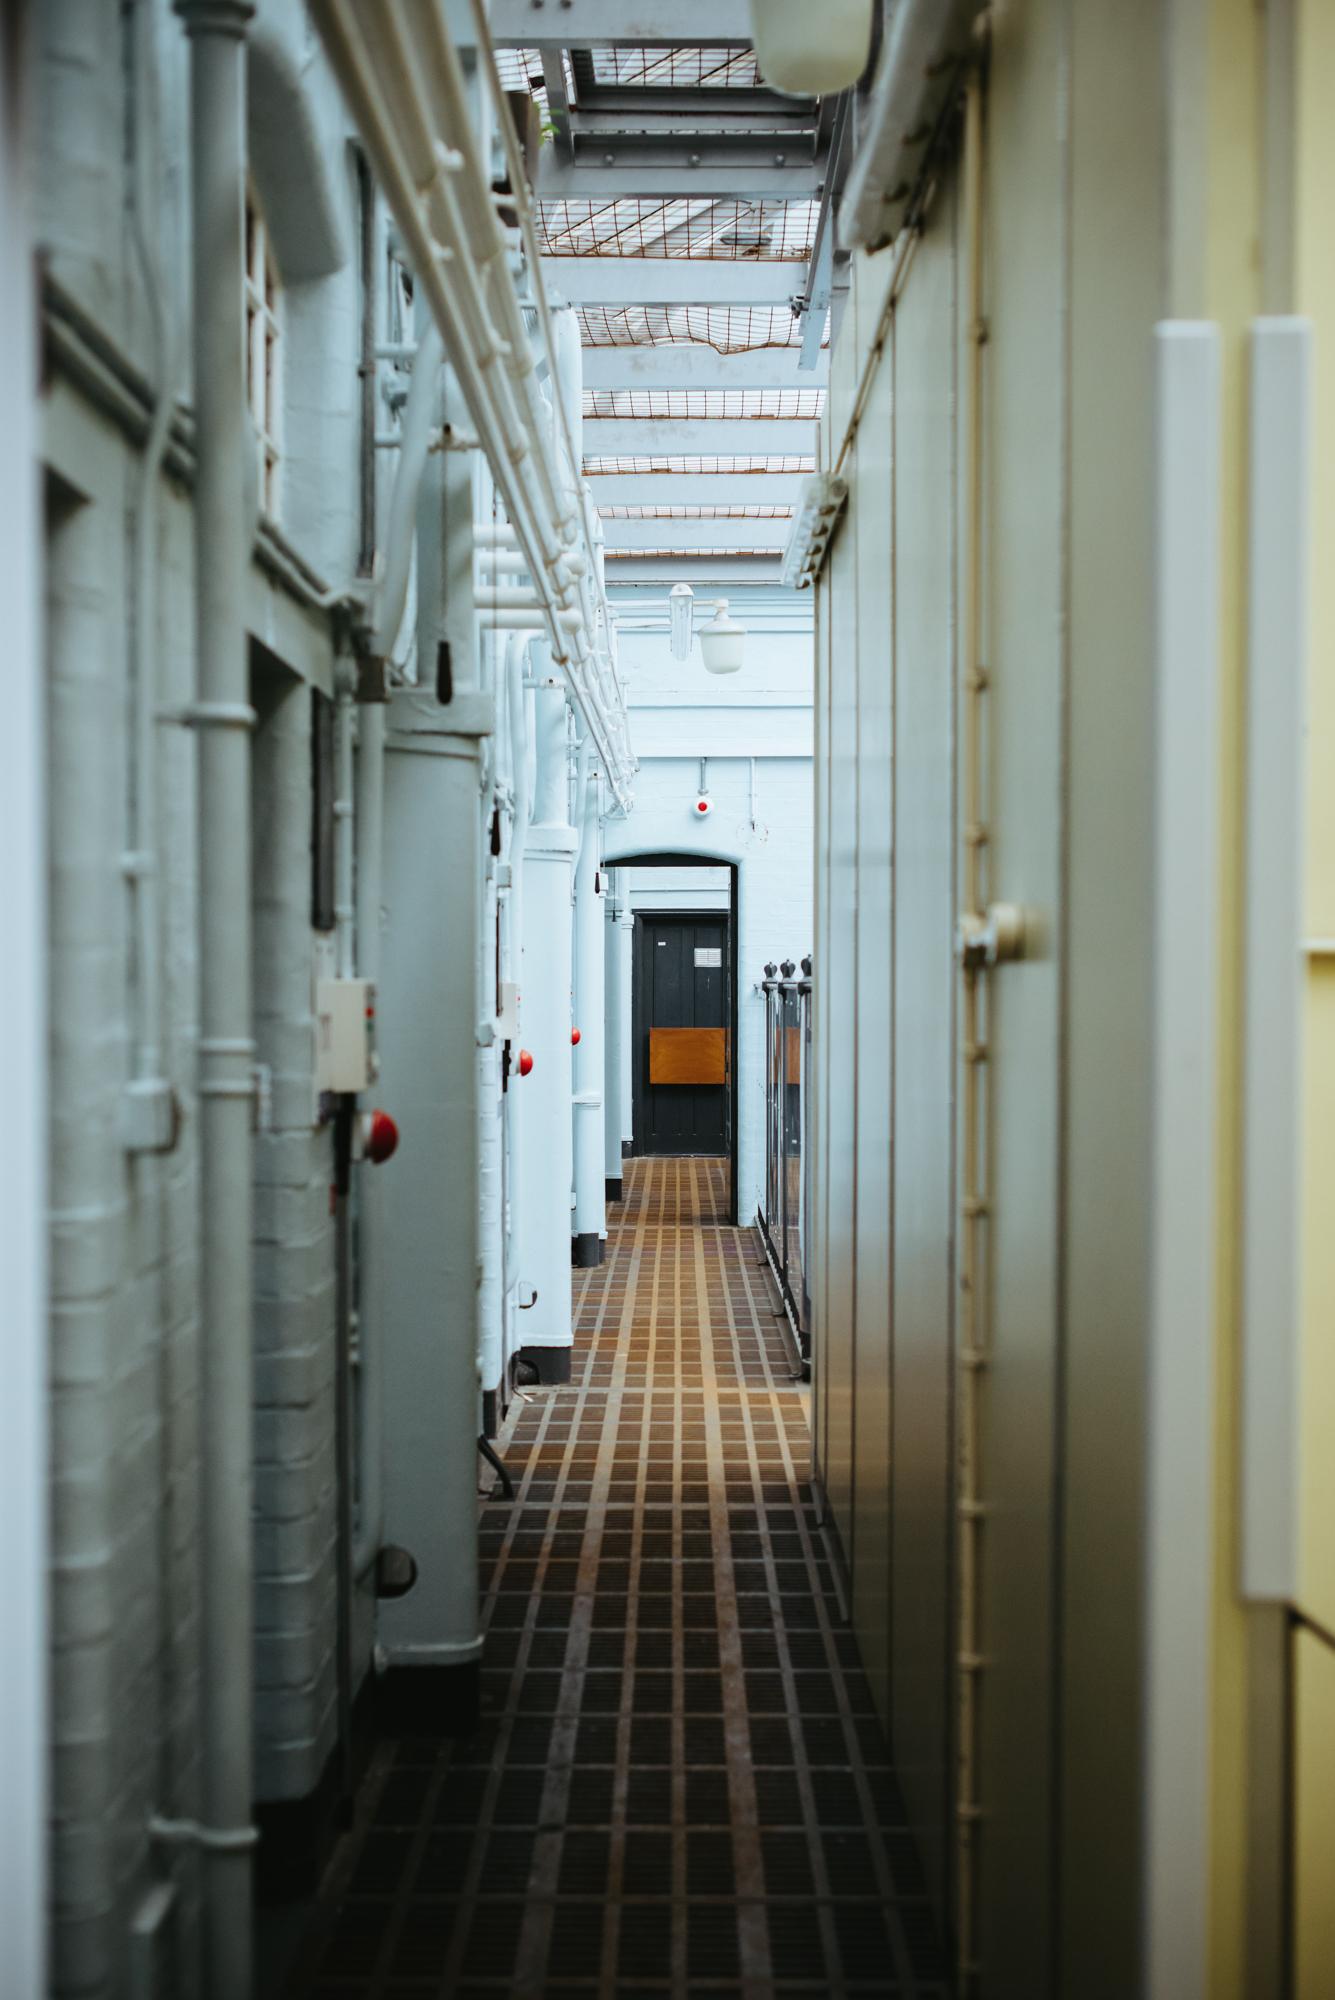 Steelhouse-Lane-Lock-Up-Birmingham-Hanny-Foxhall-_DSC1110.jpg